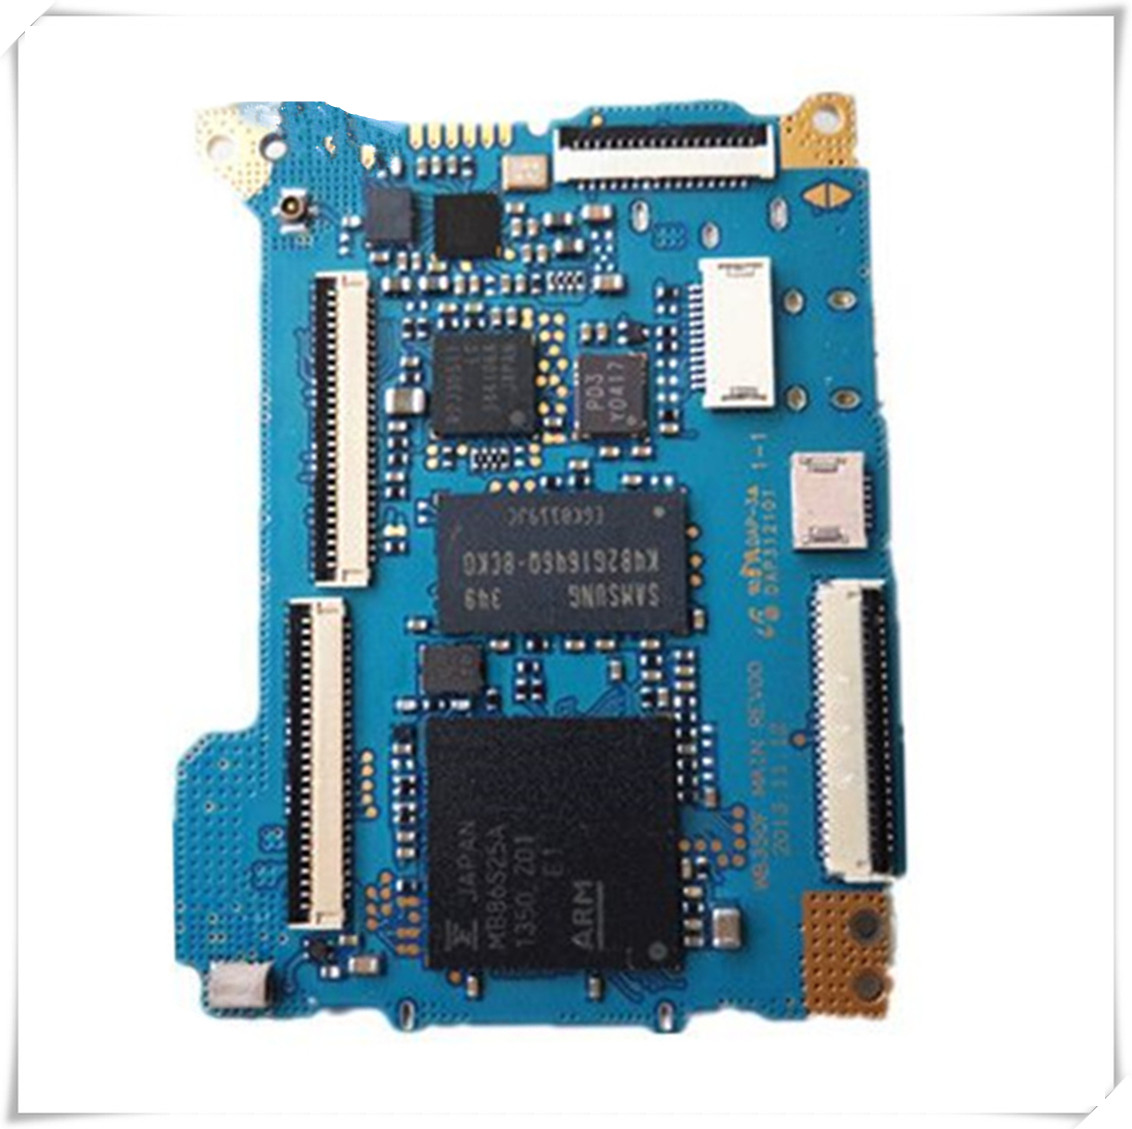 Original Motherboard For Samsung Wb350f Wb380f Mainboard Mother Board Camera Repair Parts